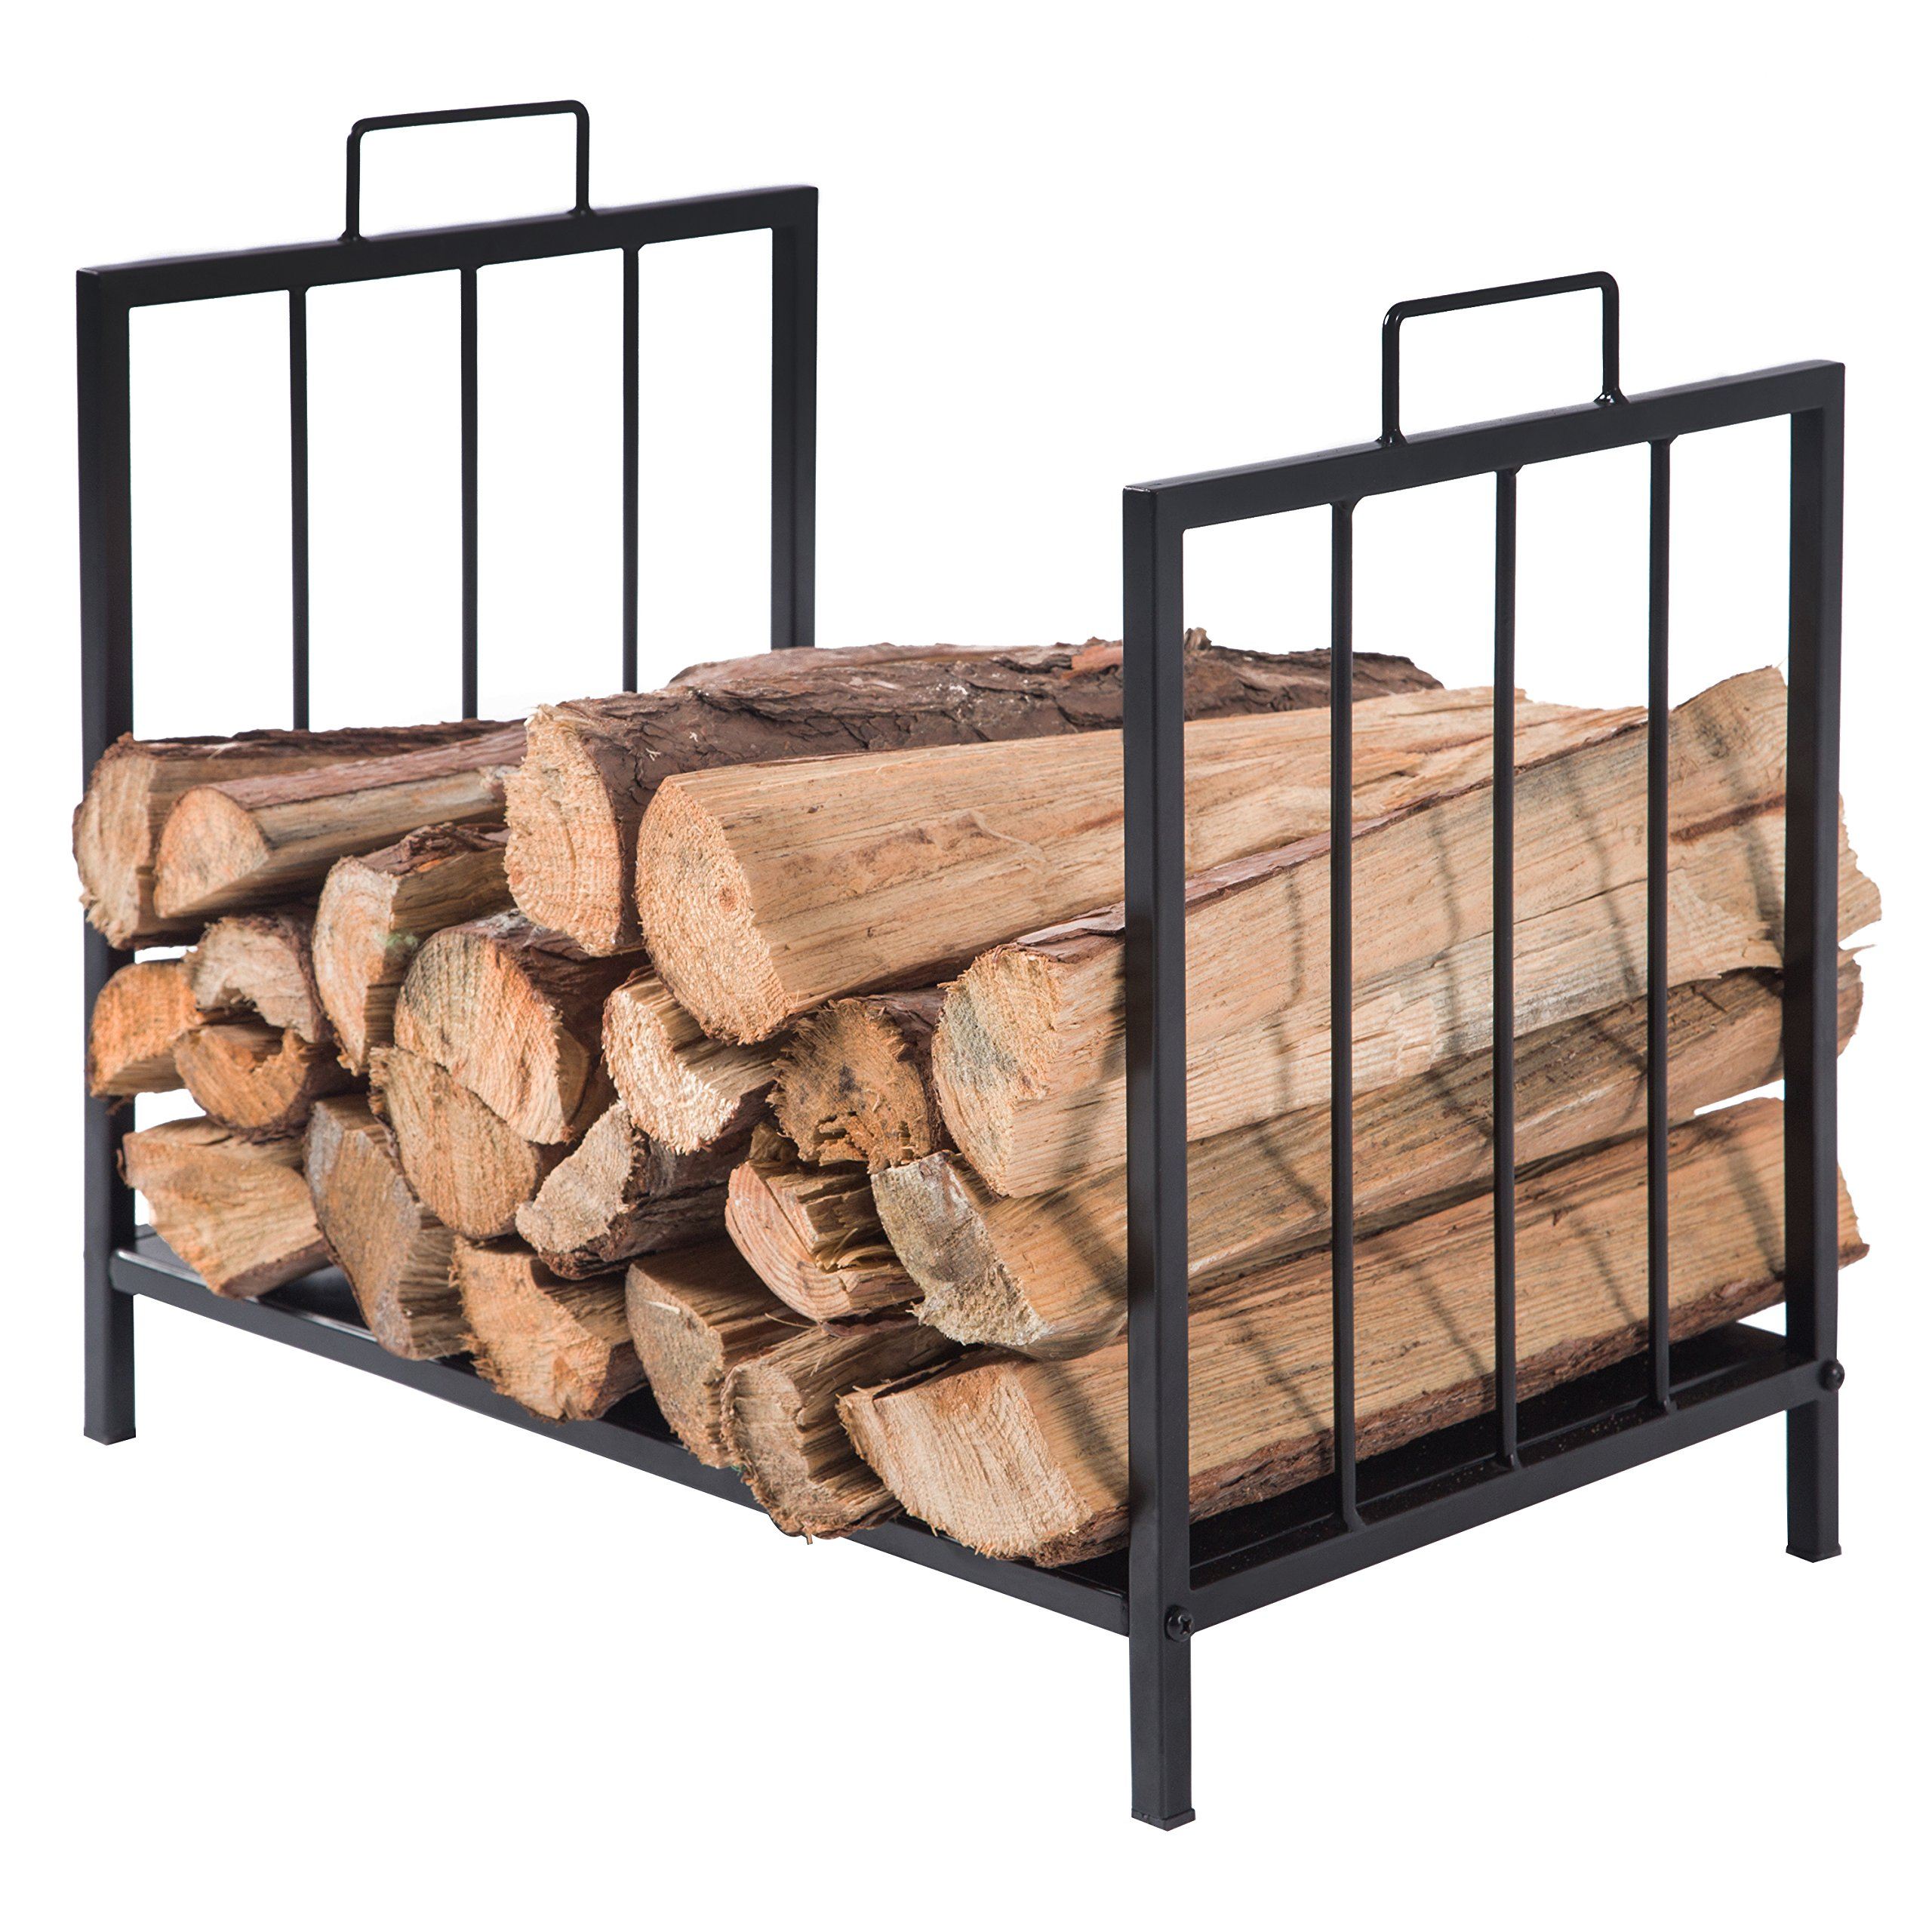 MyGift Compact Firewood Rack, Wood Log or Kindling Holder, Metal Fireplace Organizer, Black by MyGift